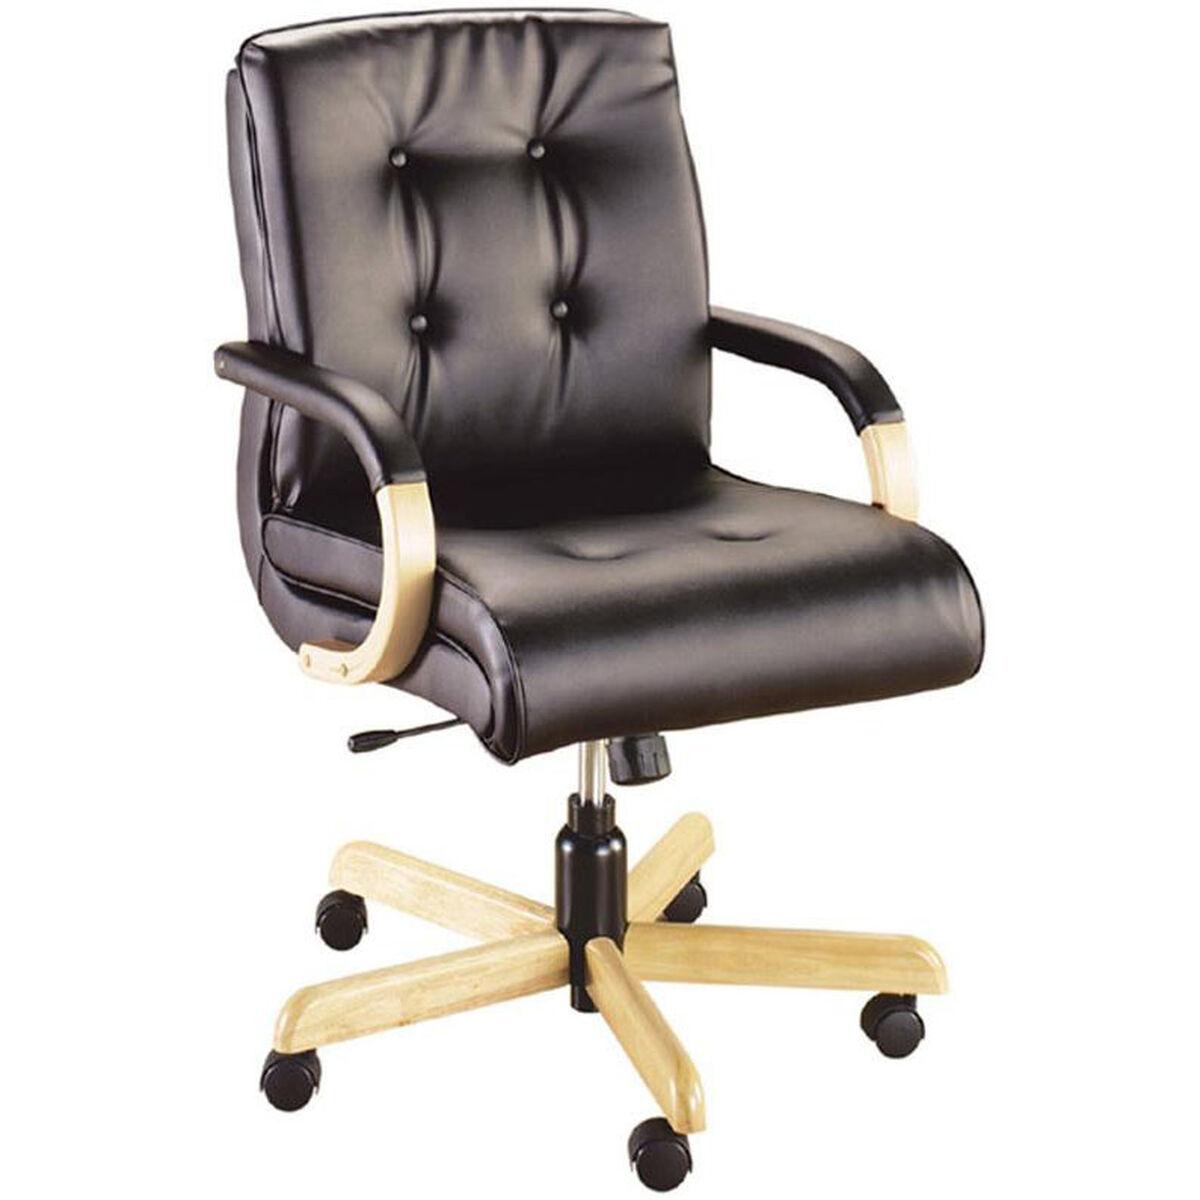 High Point Furniture Industries 3907 Hpf